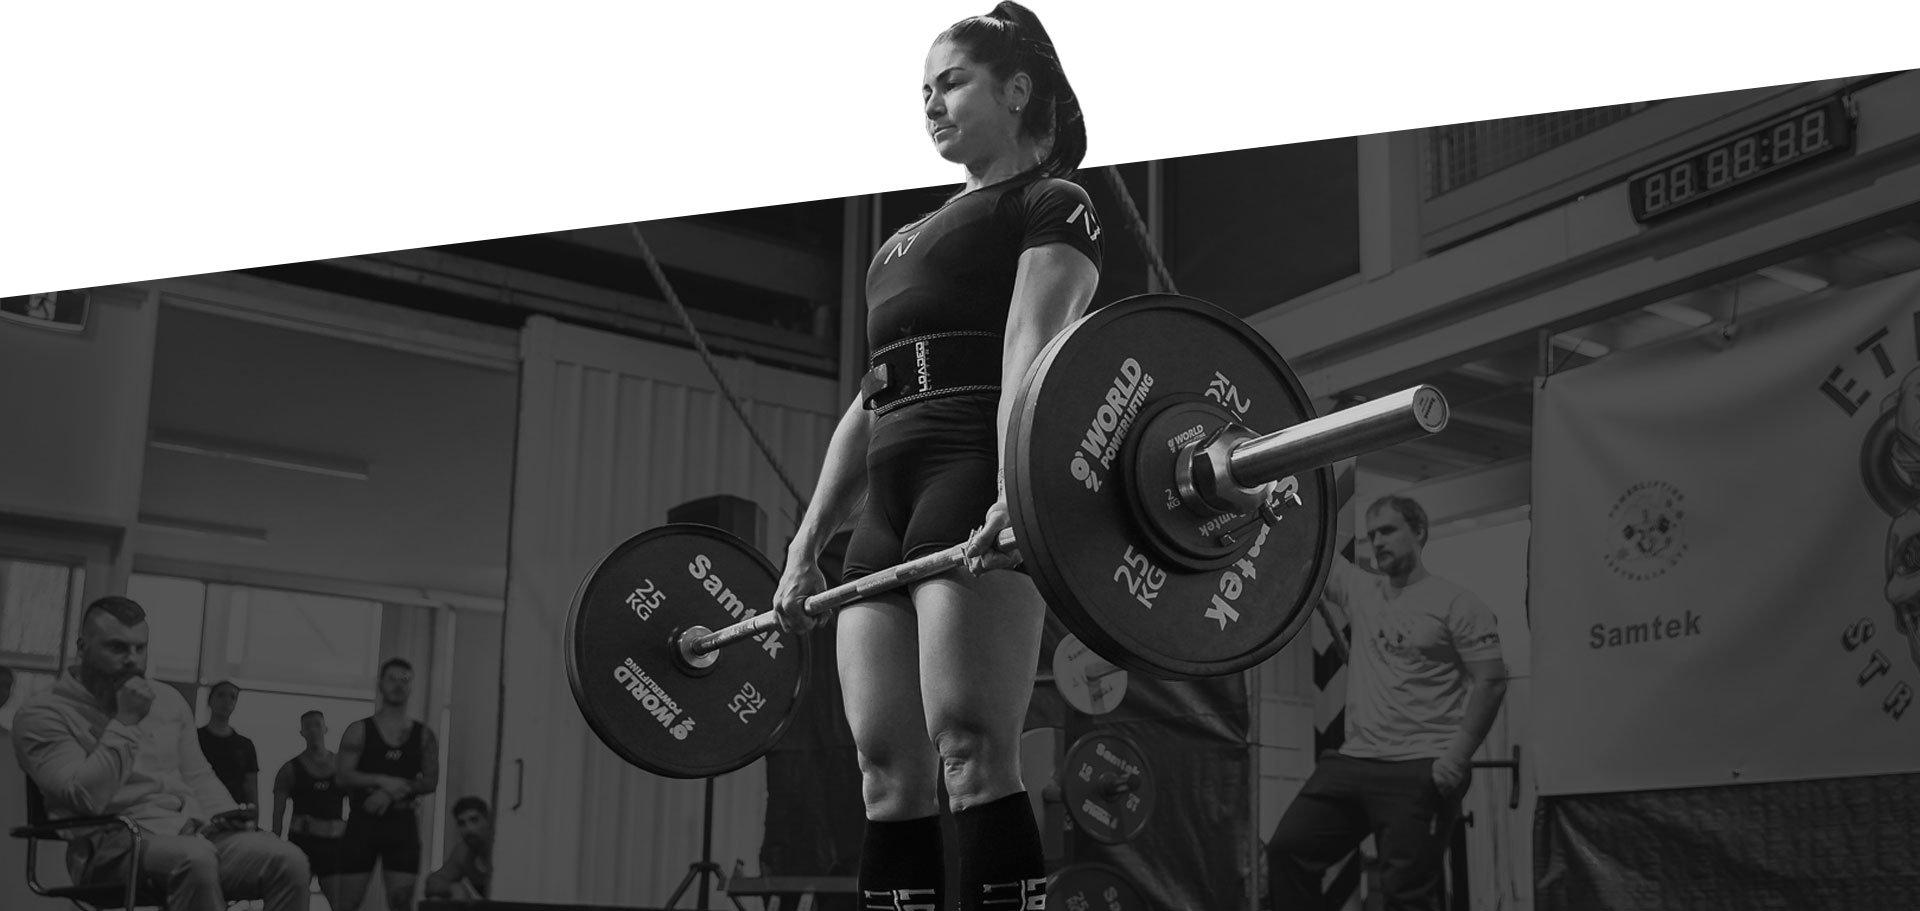 ethos-strength-bg-footer-section-03